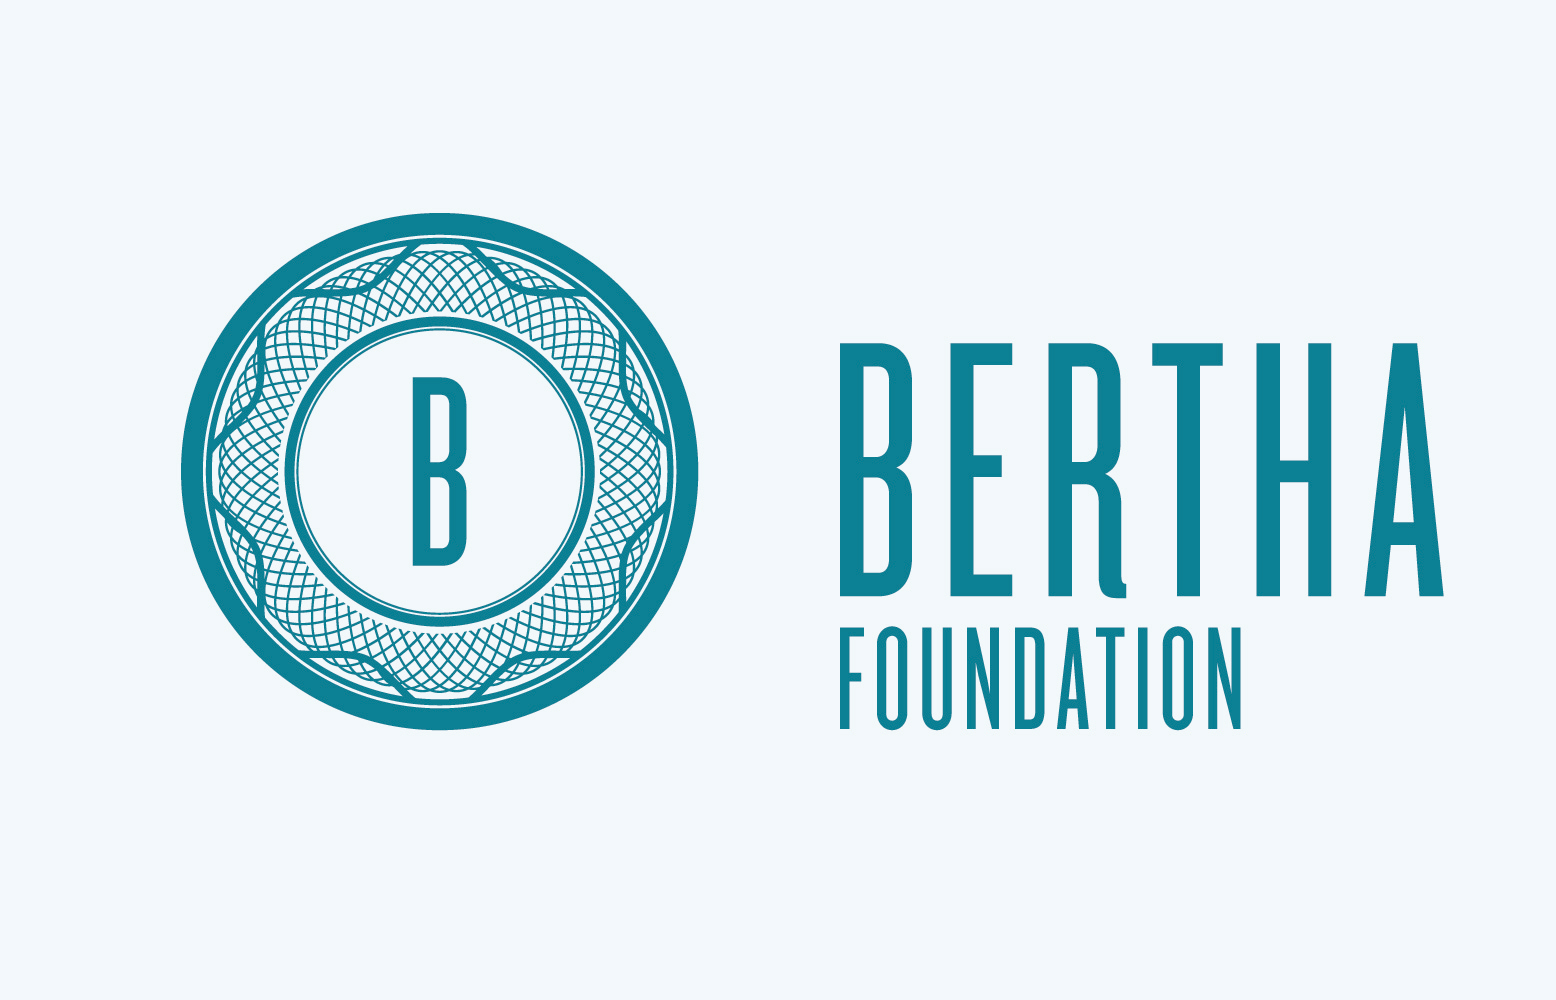 assets/static/images/sponsors/Bertha_Foundation.jpg